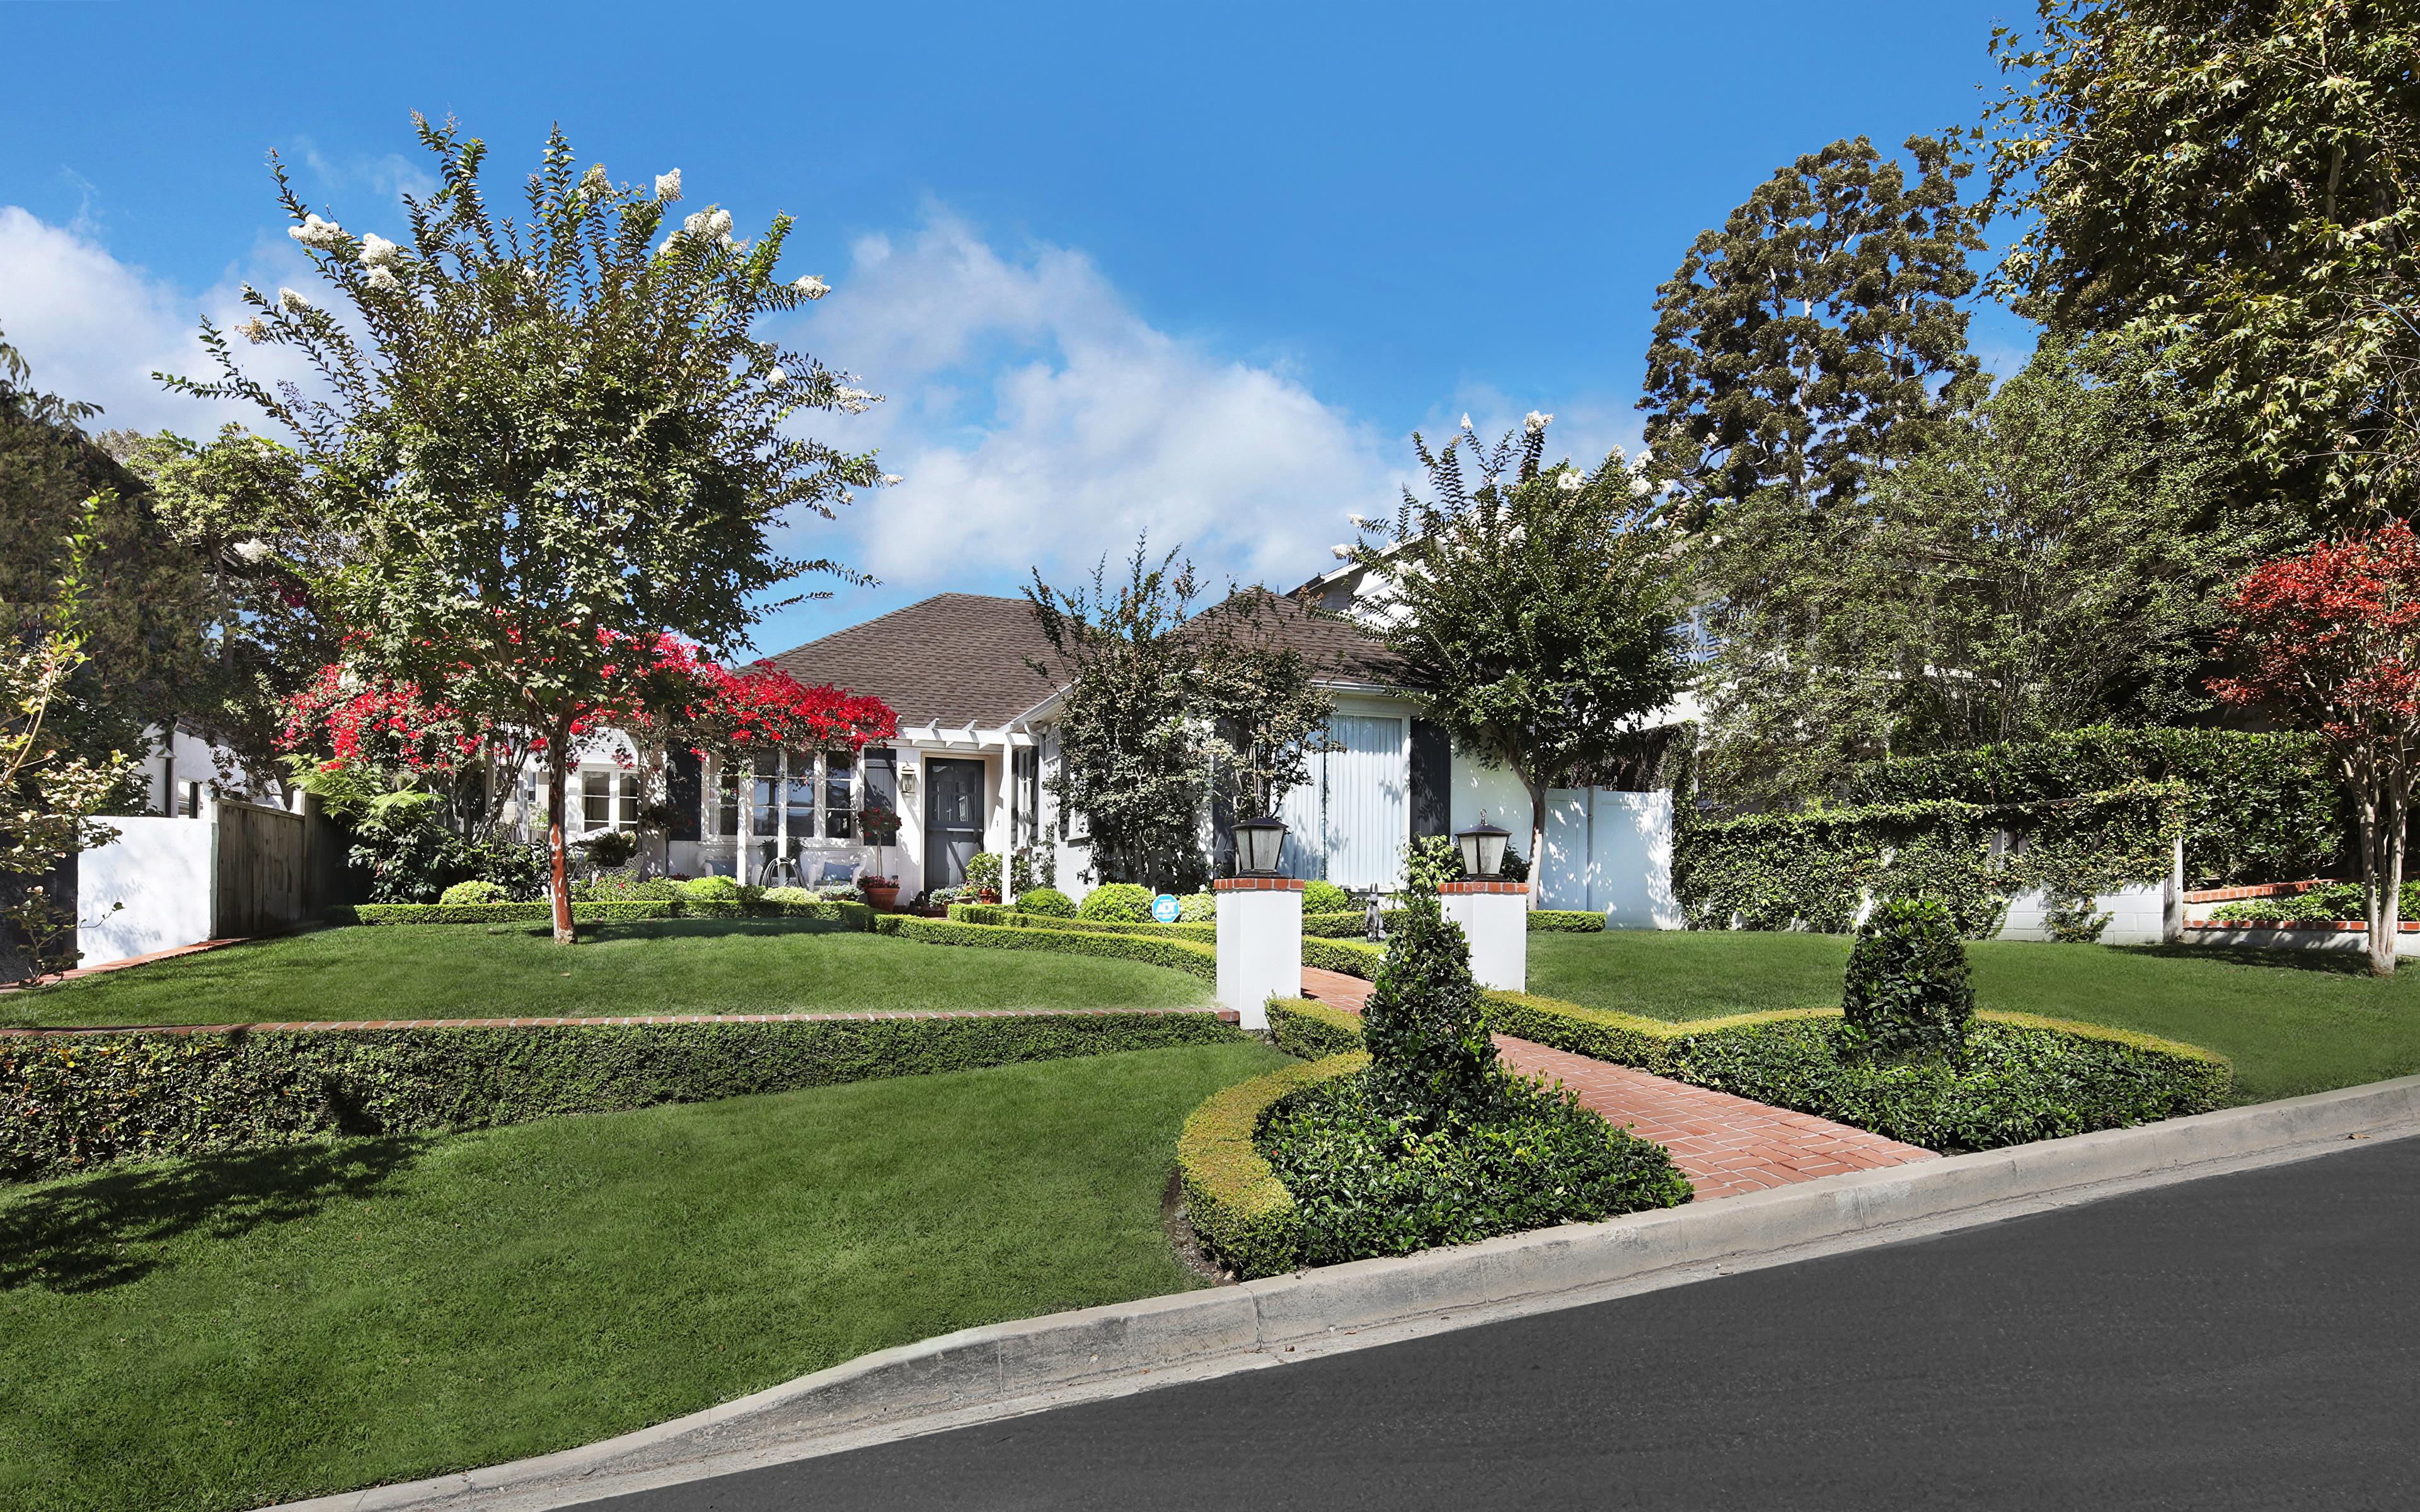 Image Usa Laguna Beach Lawn Trees Houses Cities Landscape 3840x2400